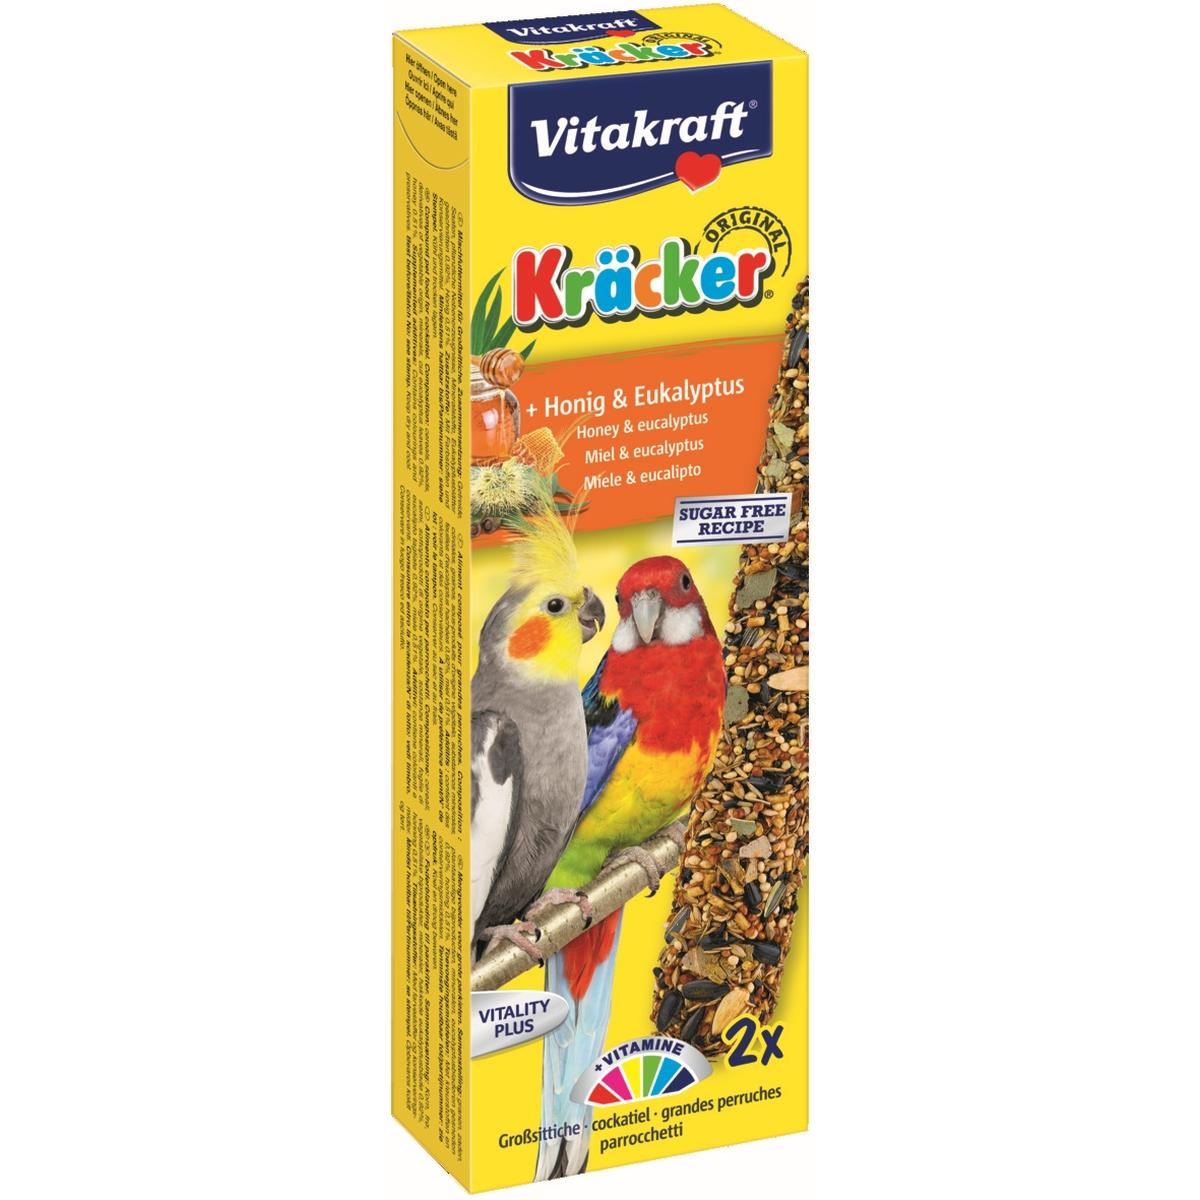 Vitakraft - kracker valkparkiet meerkleurig 216 gr